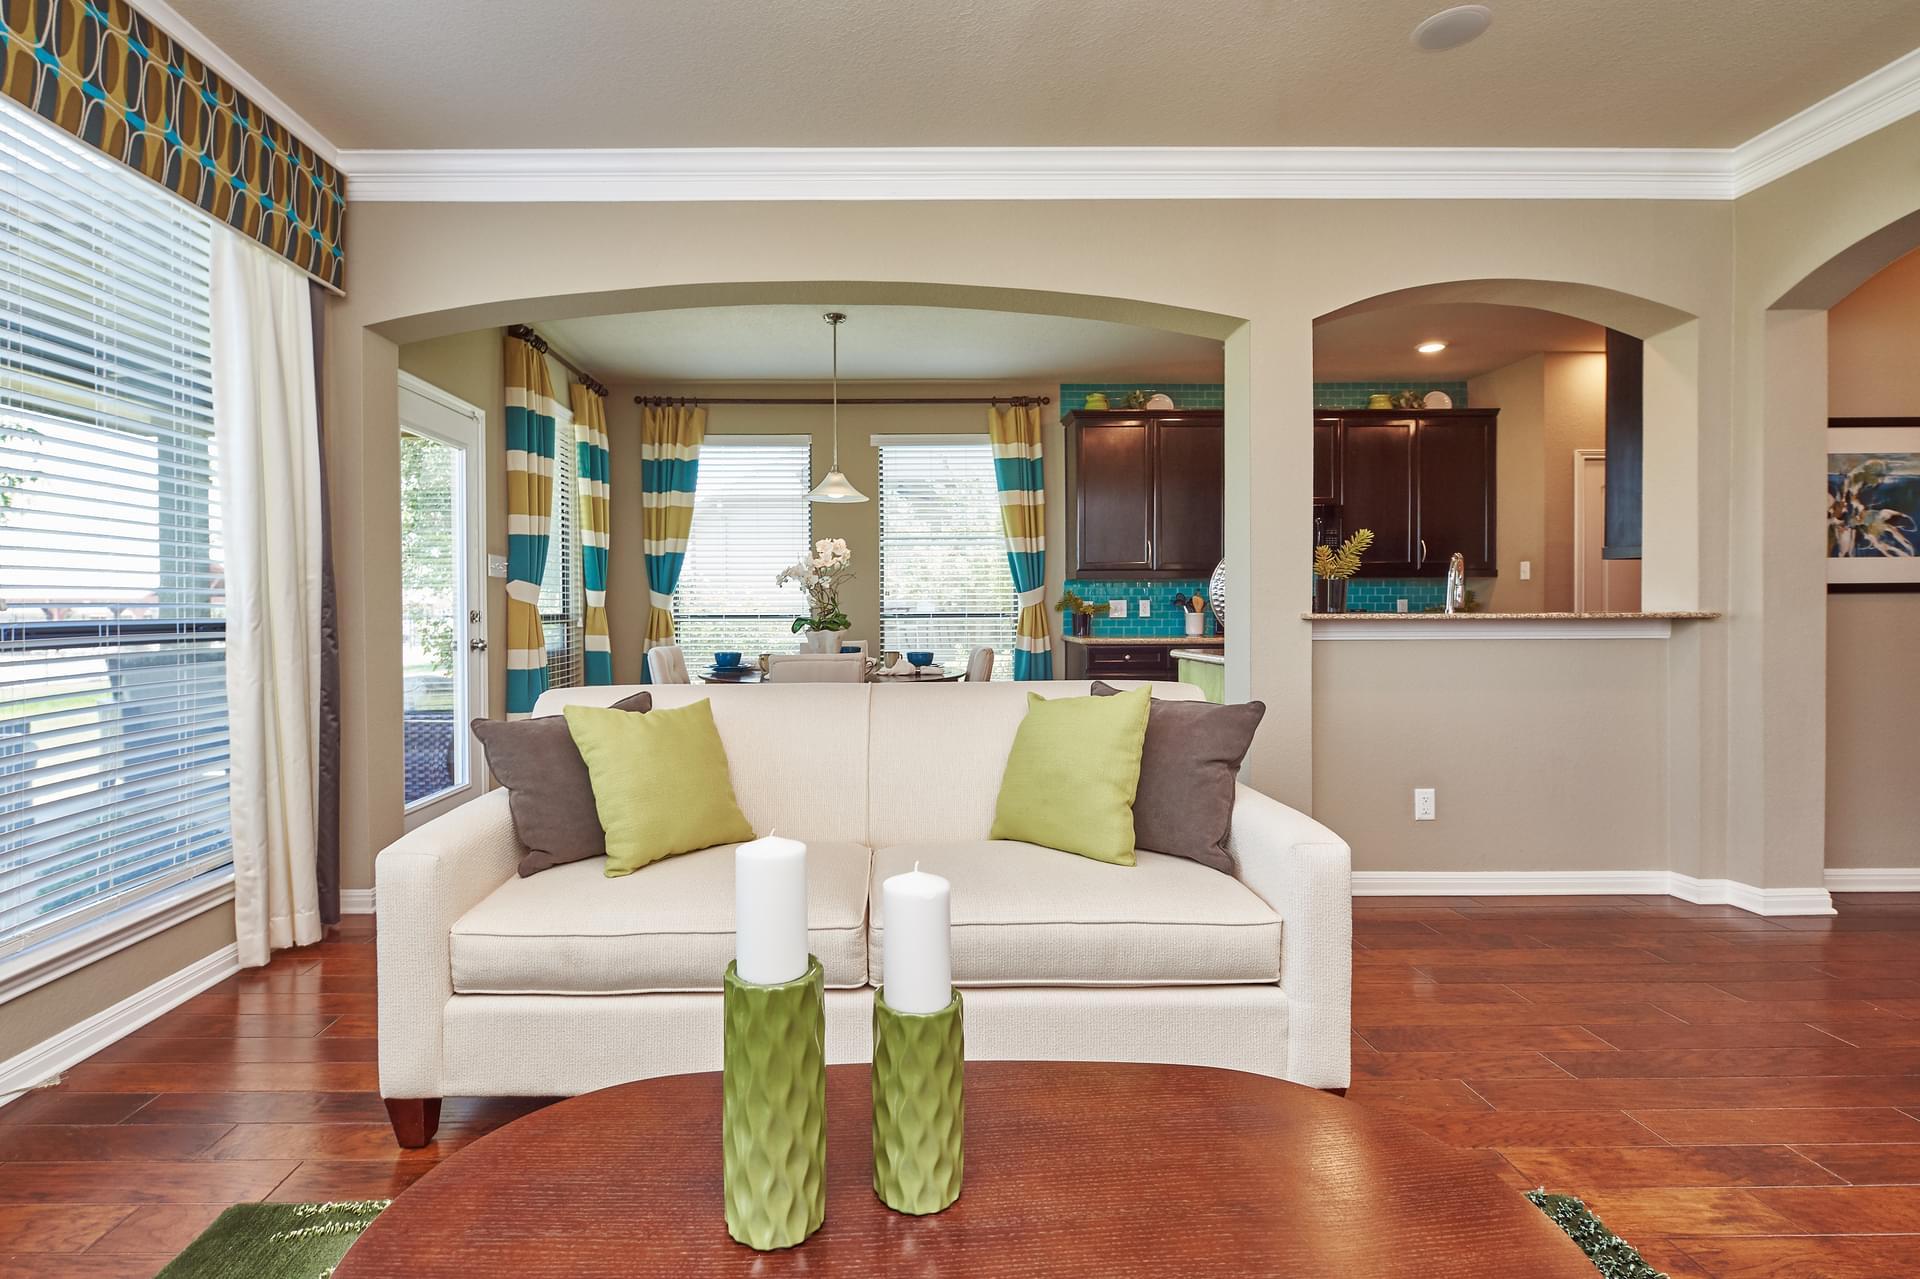 2,653sf New Home in Killeen, TX